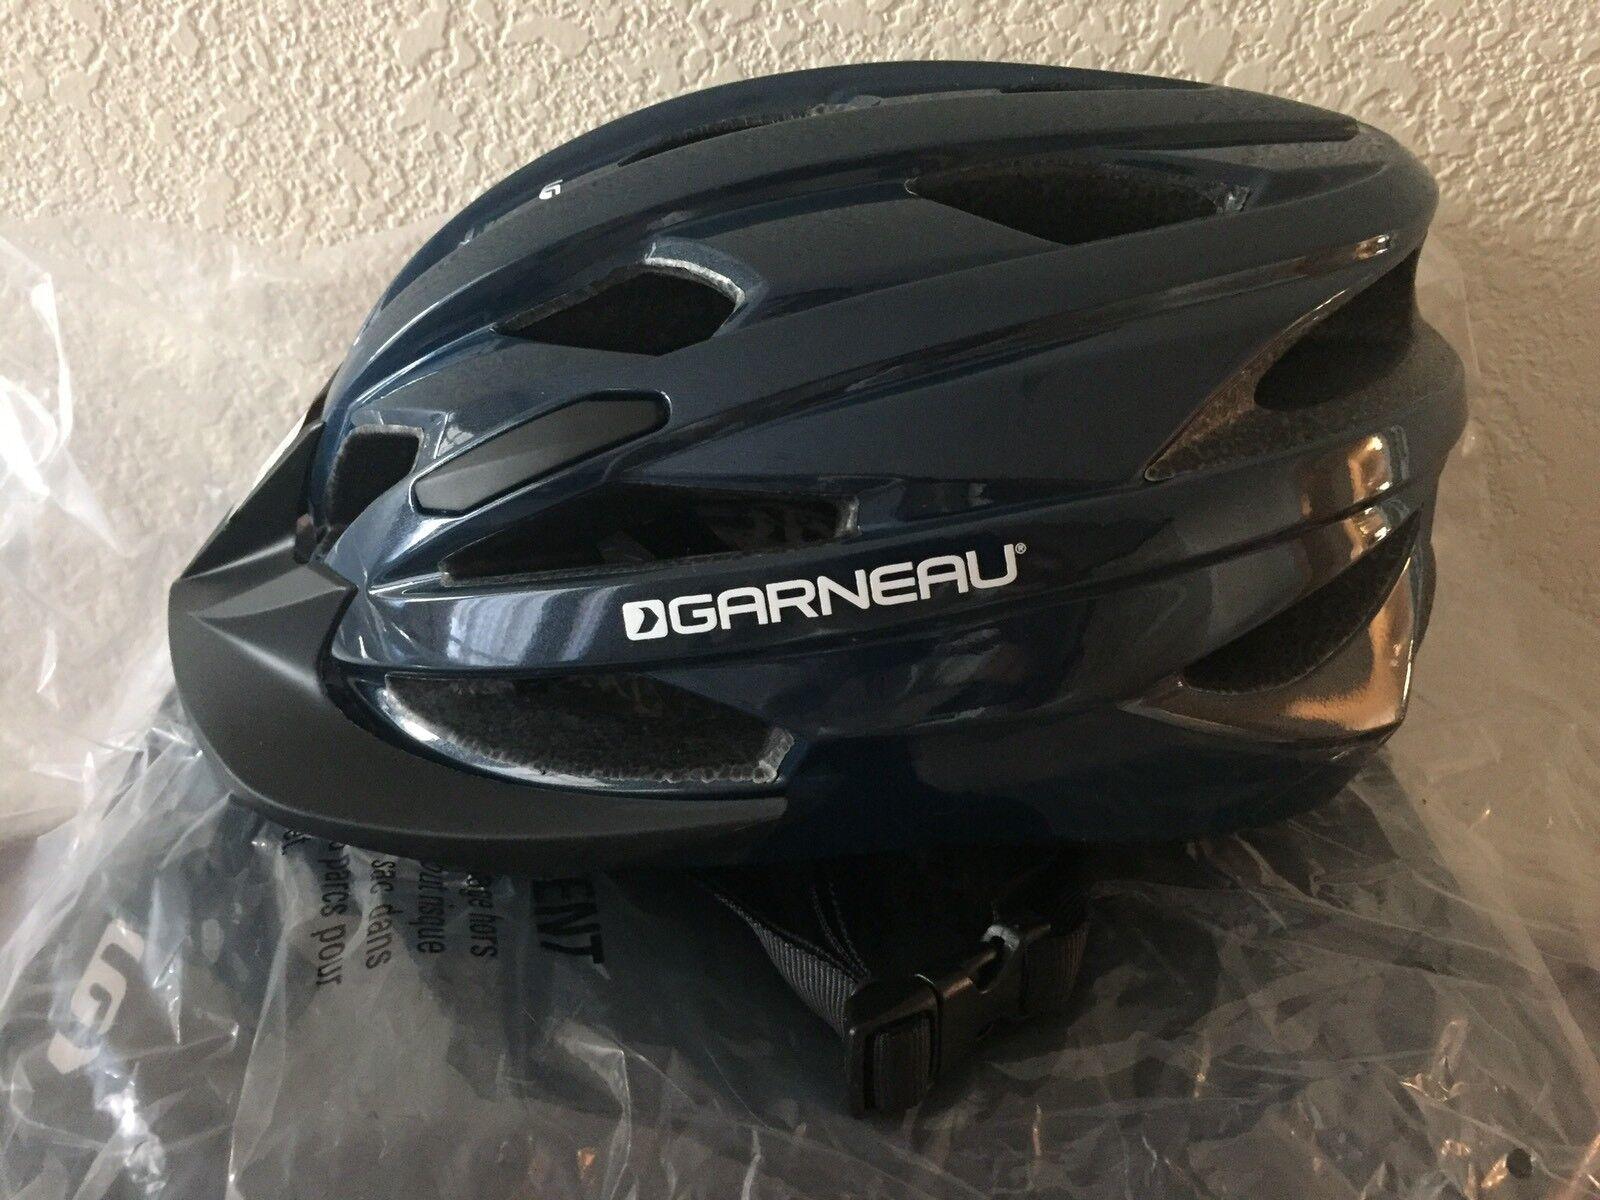 Garneau Cycling Bicycle Helmet Eagle UA Navy bluee -  Brand New  timeless classic